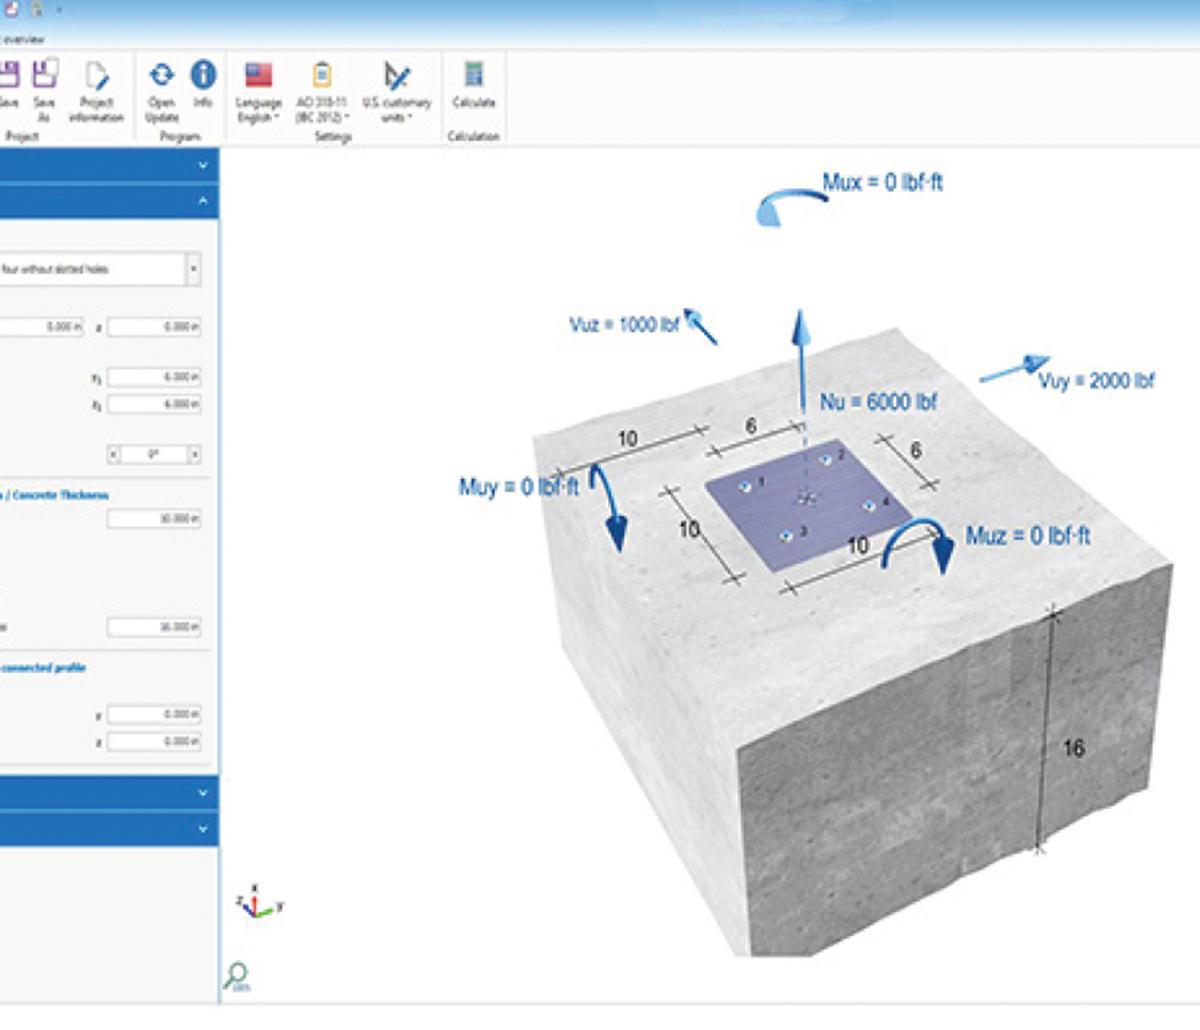 MiTek Anchor Design Software - Screenshot of MiTek Anchor Design Software with model of cement and anchor